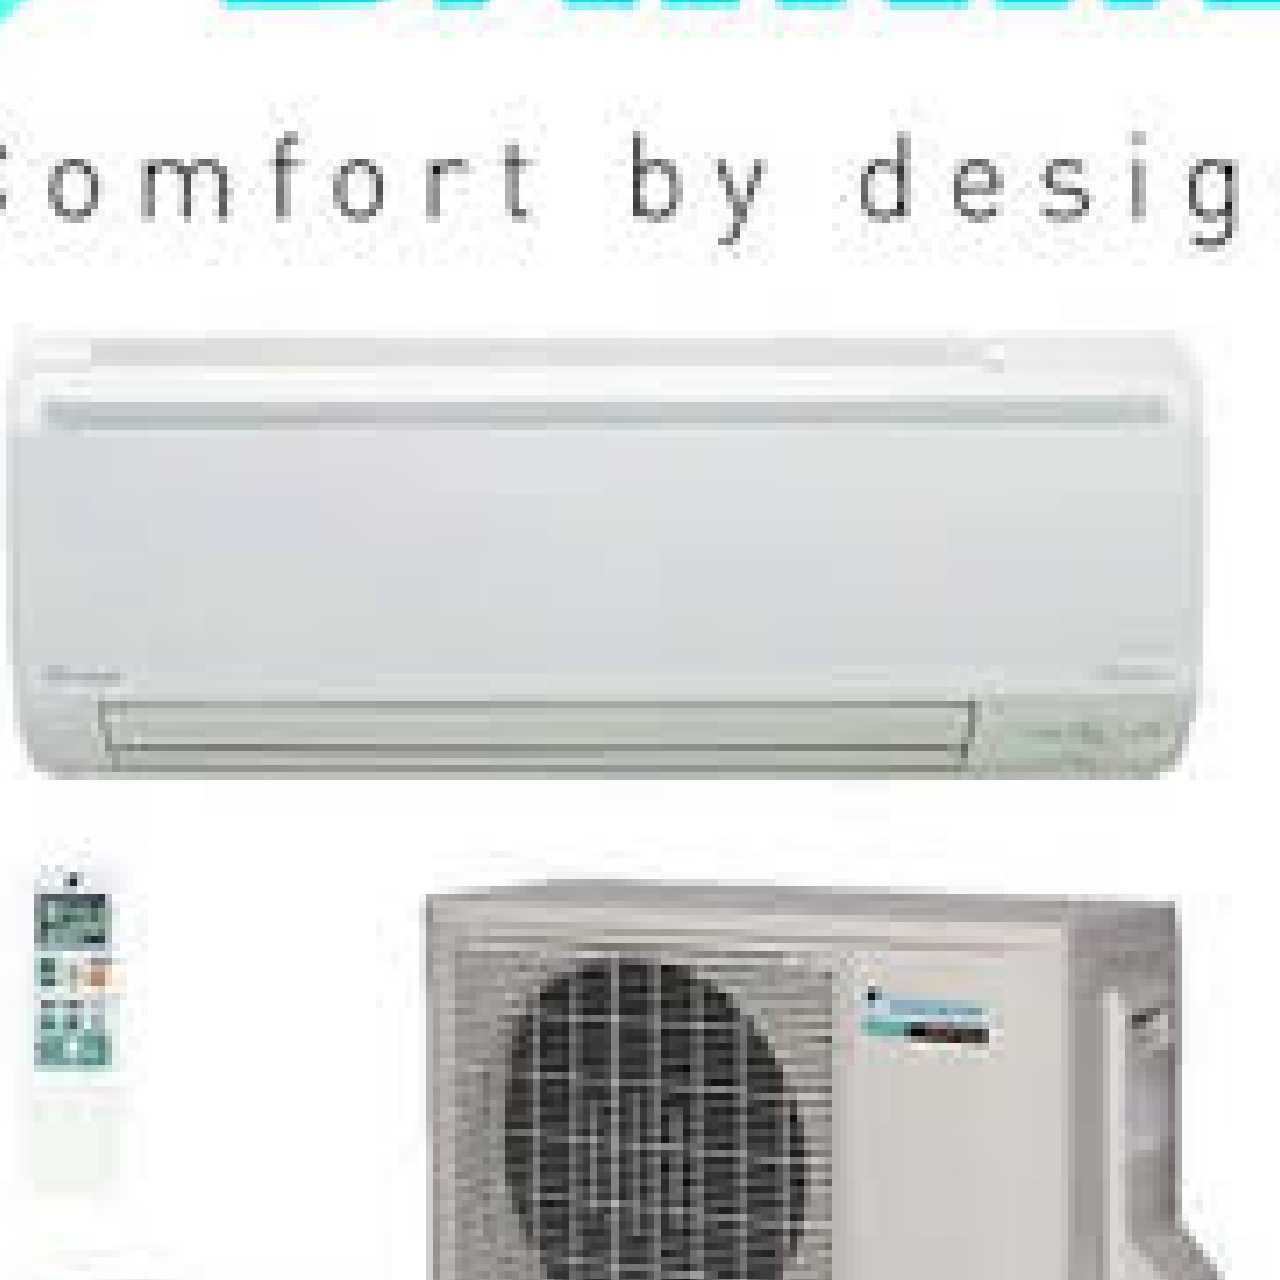 Daikin Heat Pumps 506 381 5950 Call Text Joshua Niceguyecoheat Mini Split Wiring Diagram Niceguy